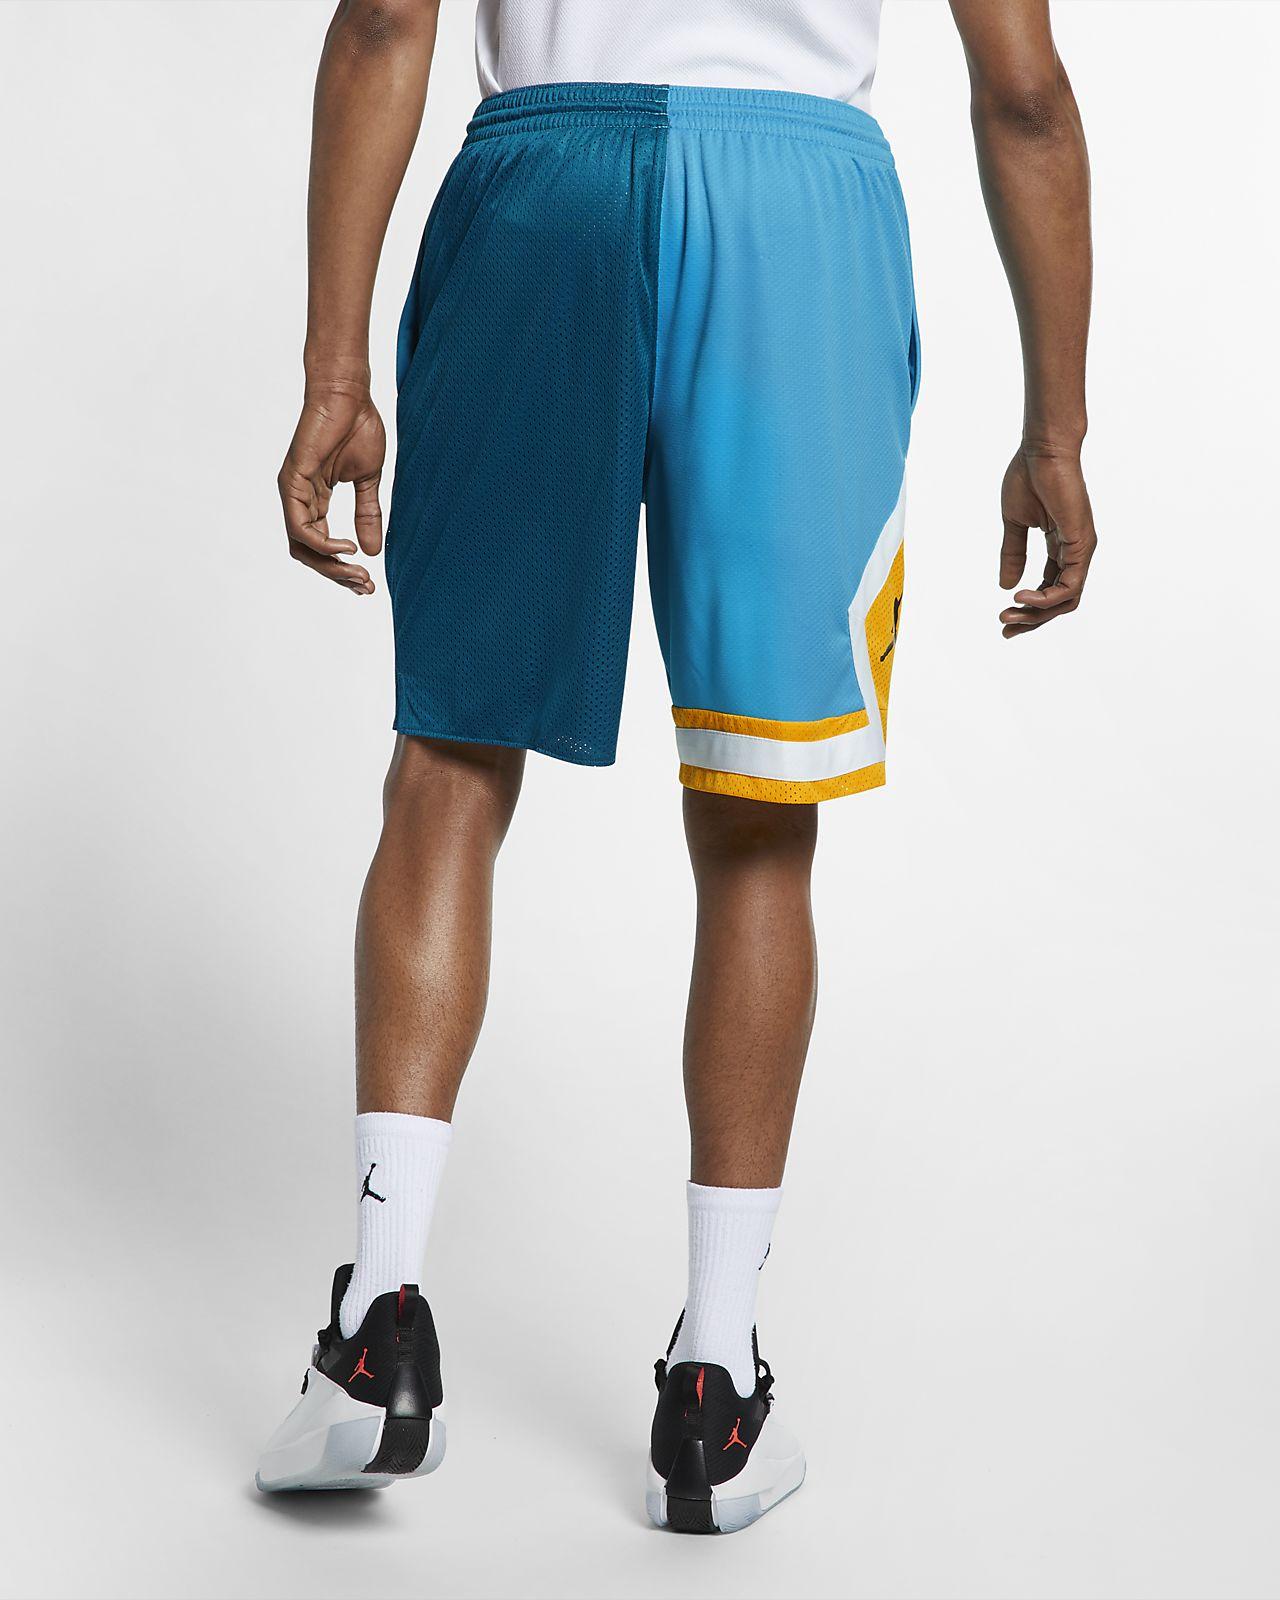 2363aeb0b43 Jordan DNA Distorted Men's Basketball Shorts